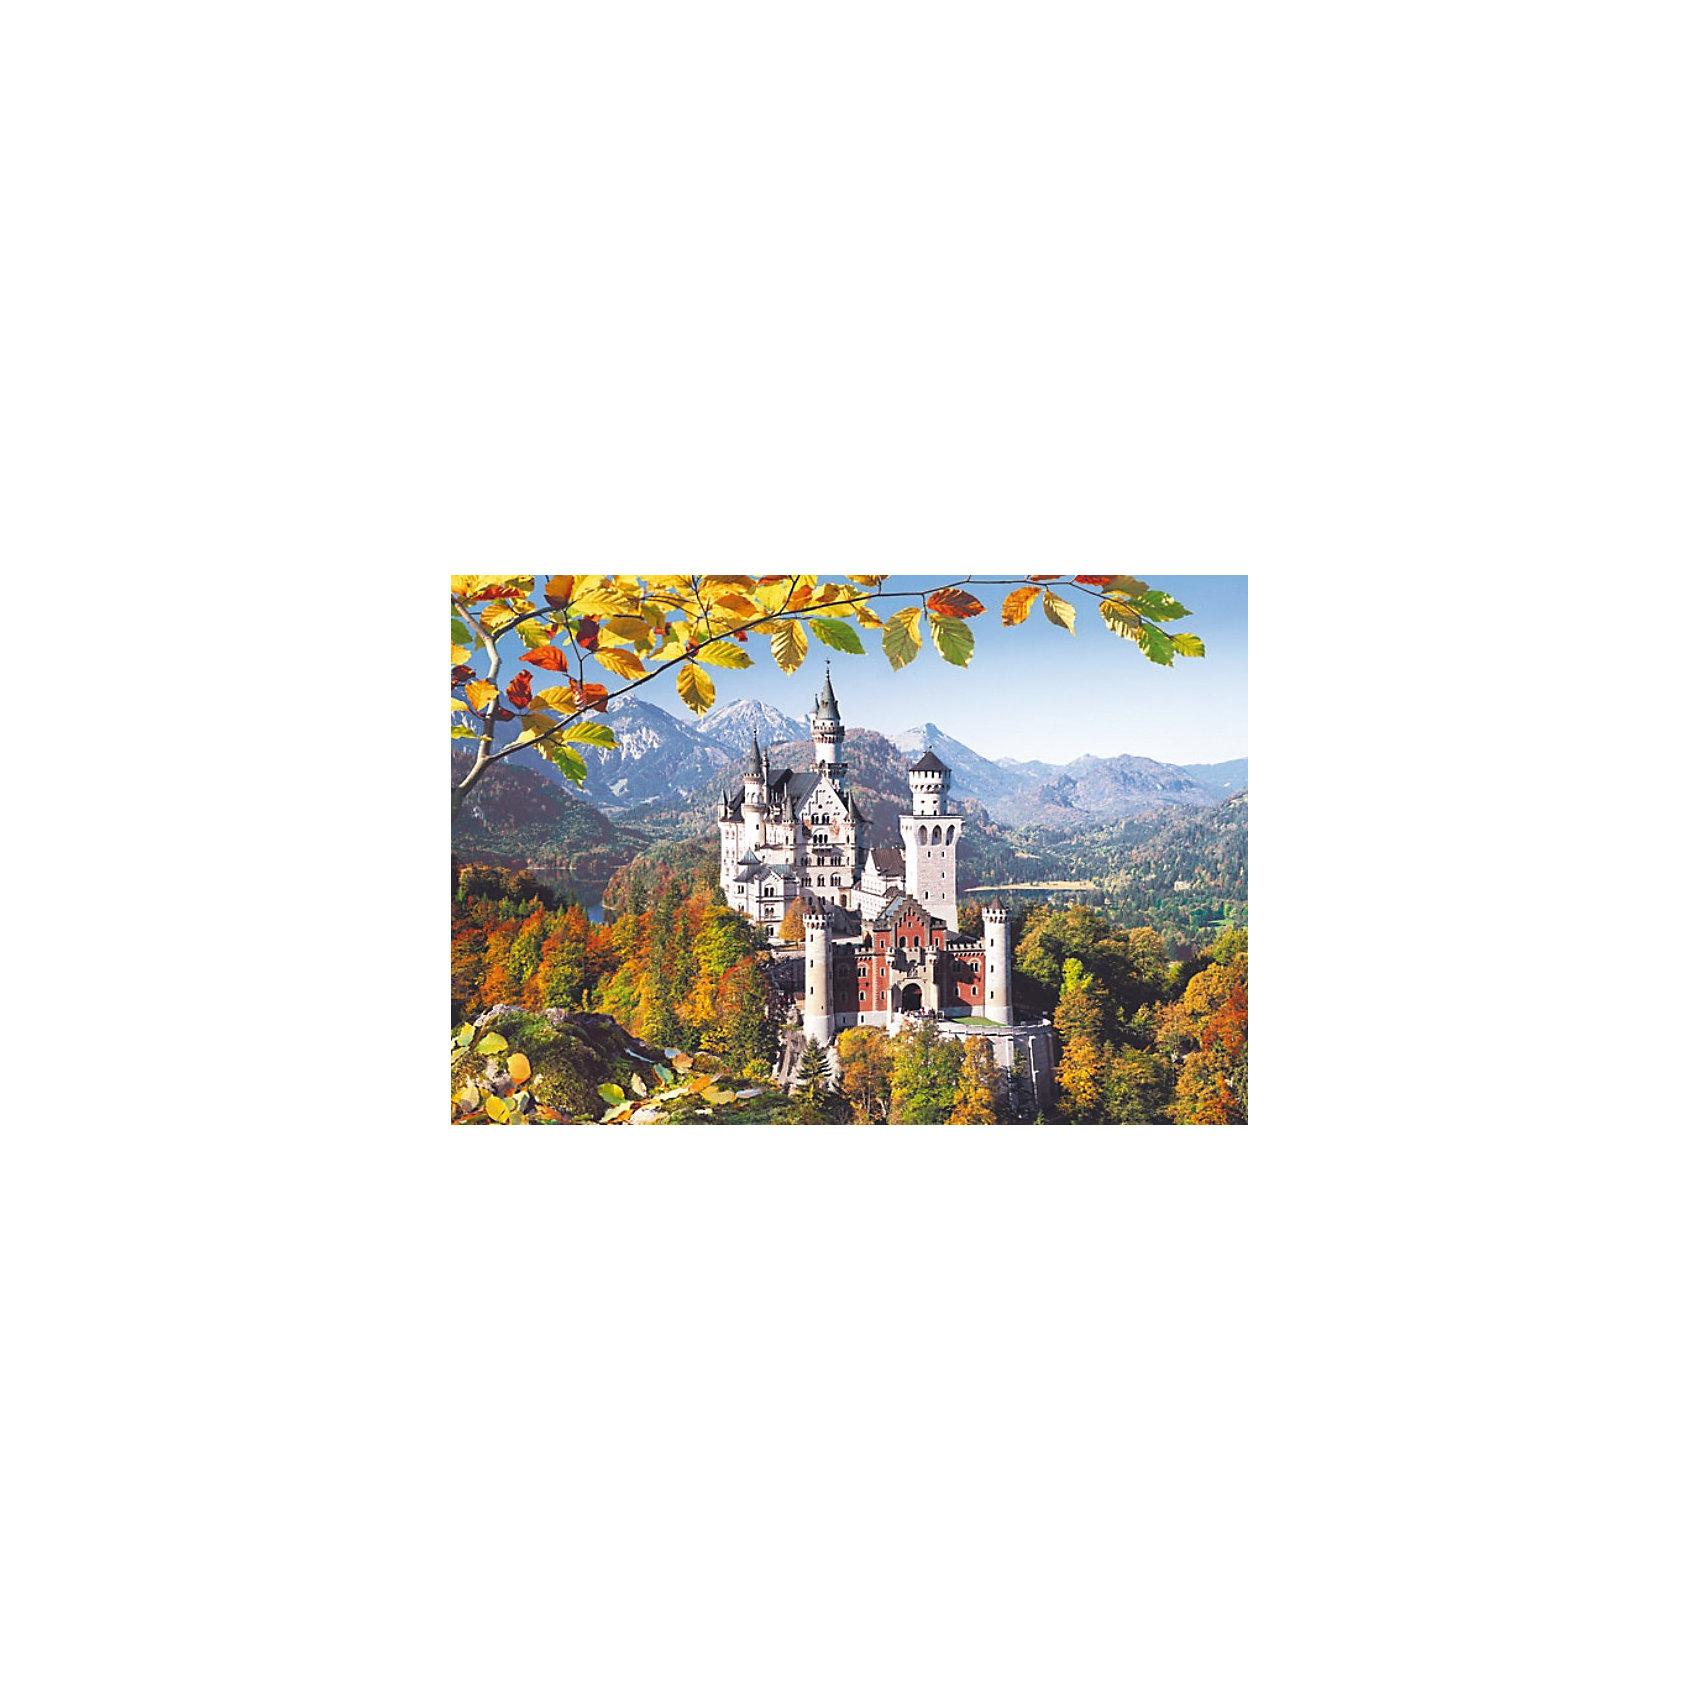 Castorland Пазл Бавария, 3000 деталей, Castorland пазл для раскрашивания арт терапия царь зверей origami 360 деталей